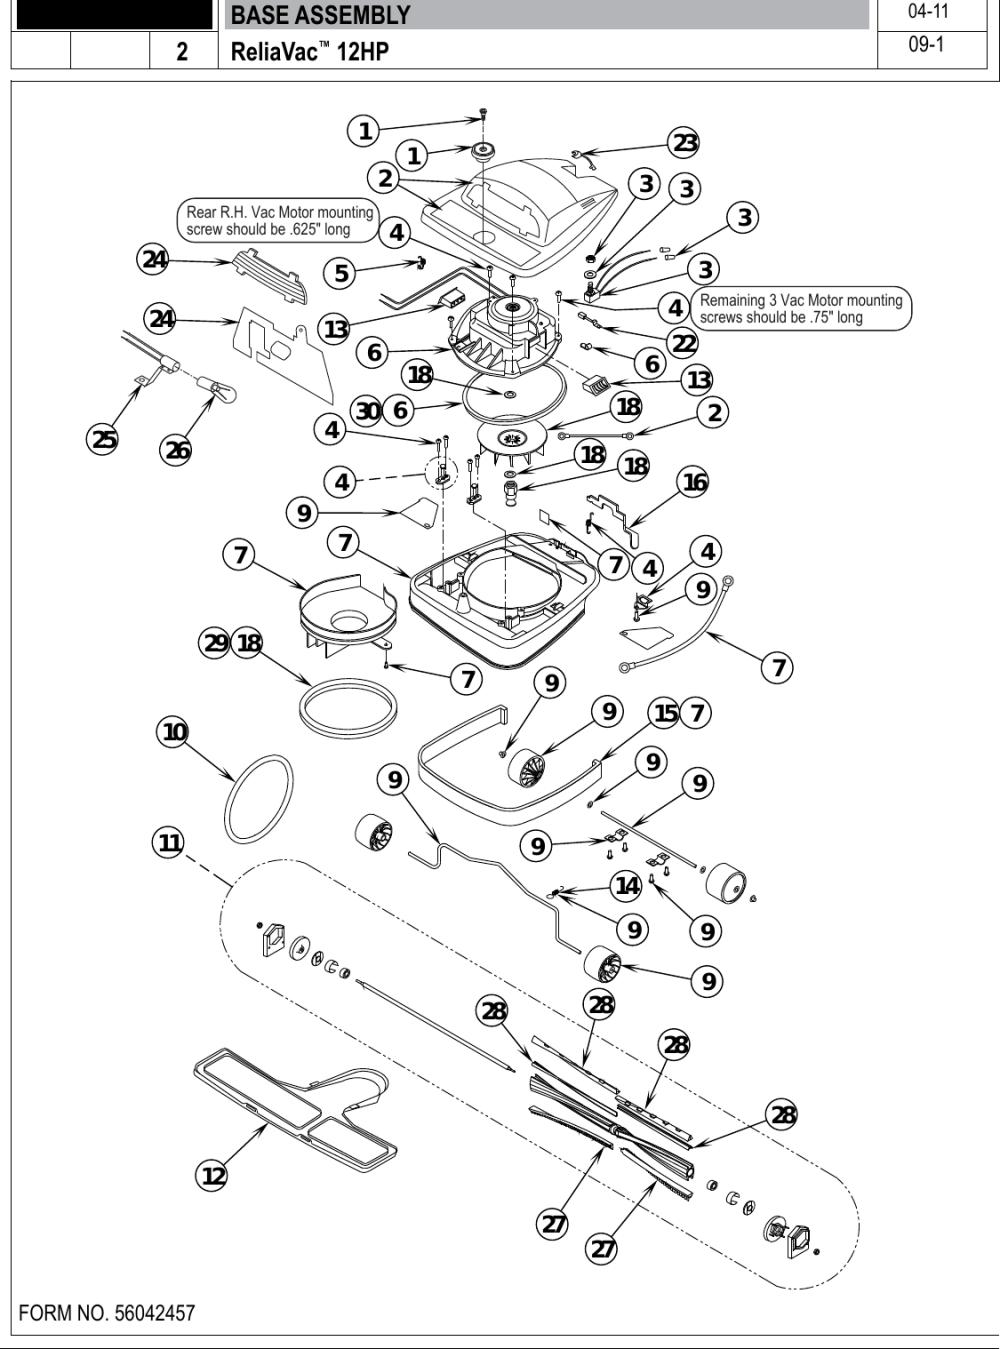 medium resolution of page 4 of 12 clarke reliavac 12hp upright vacuum parts